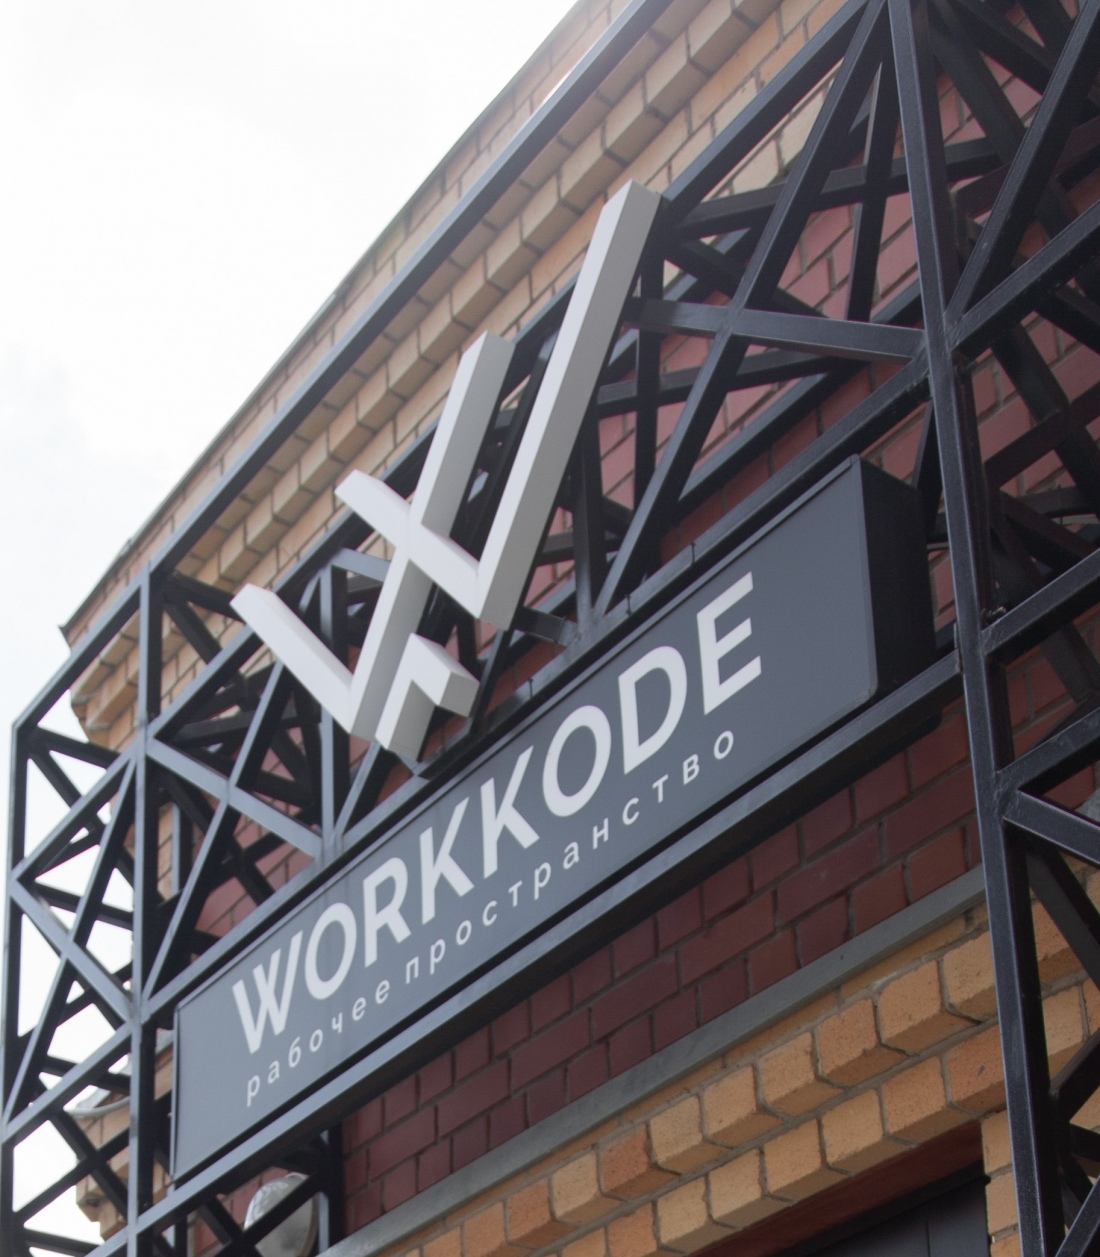 Workkode